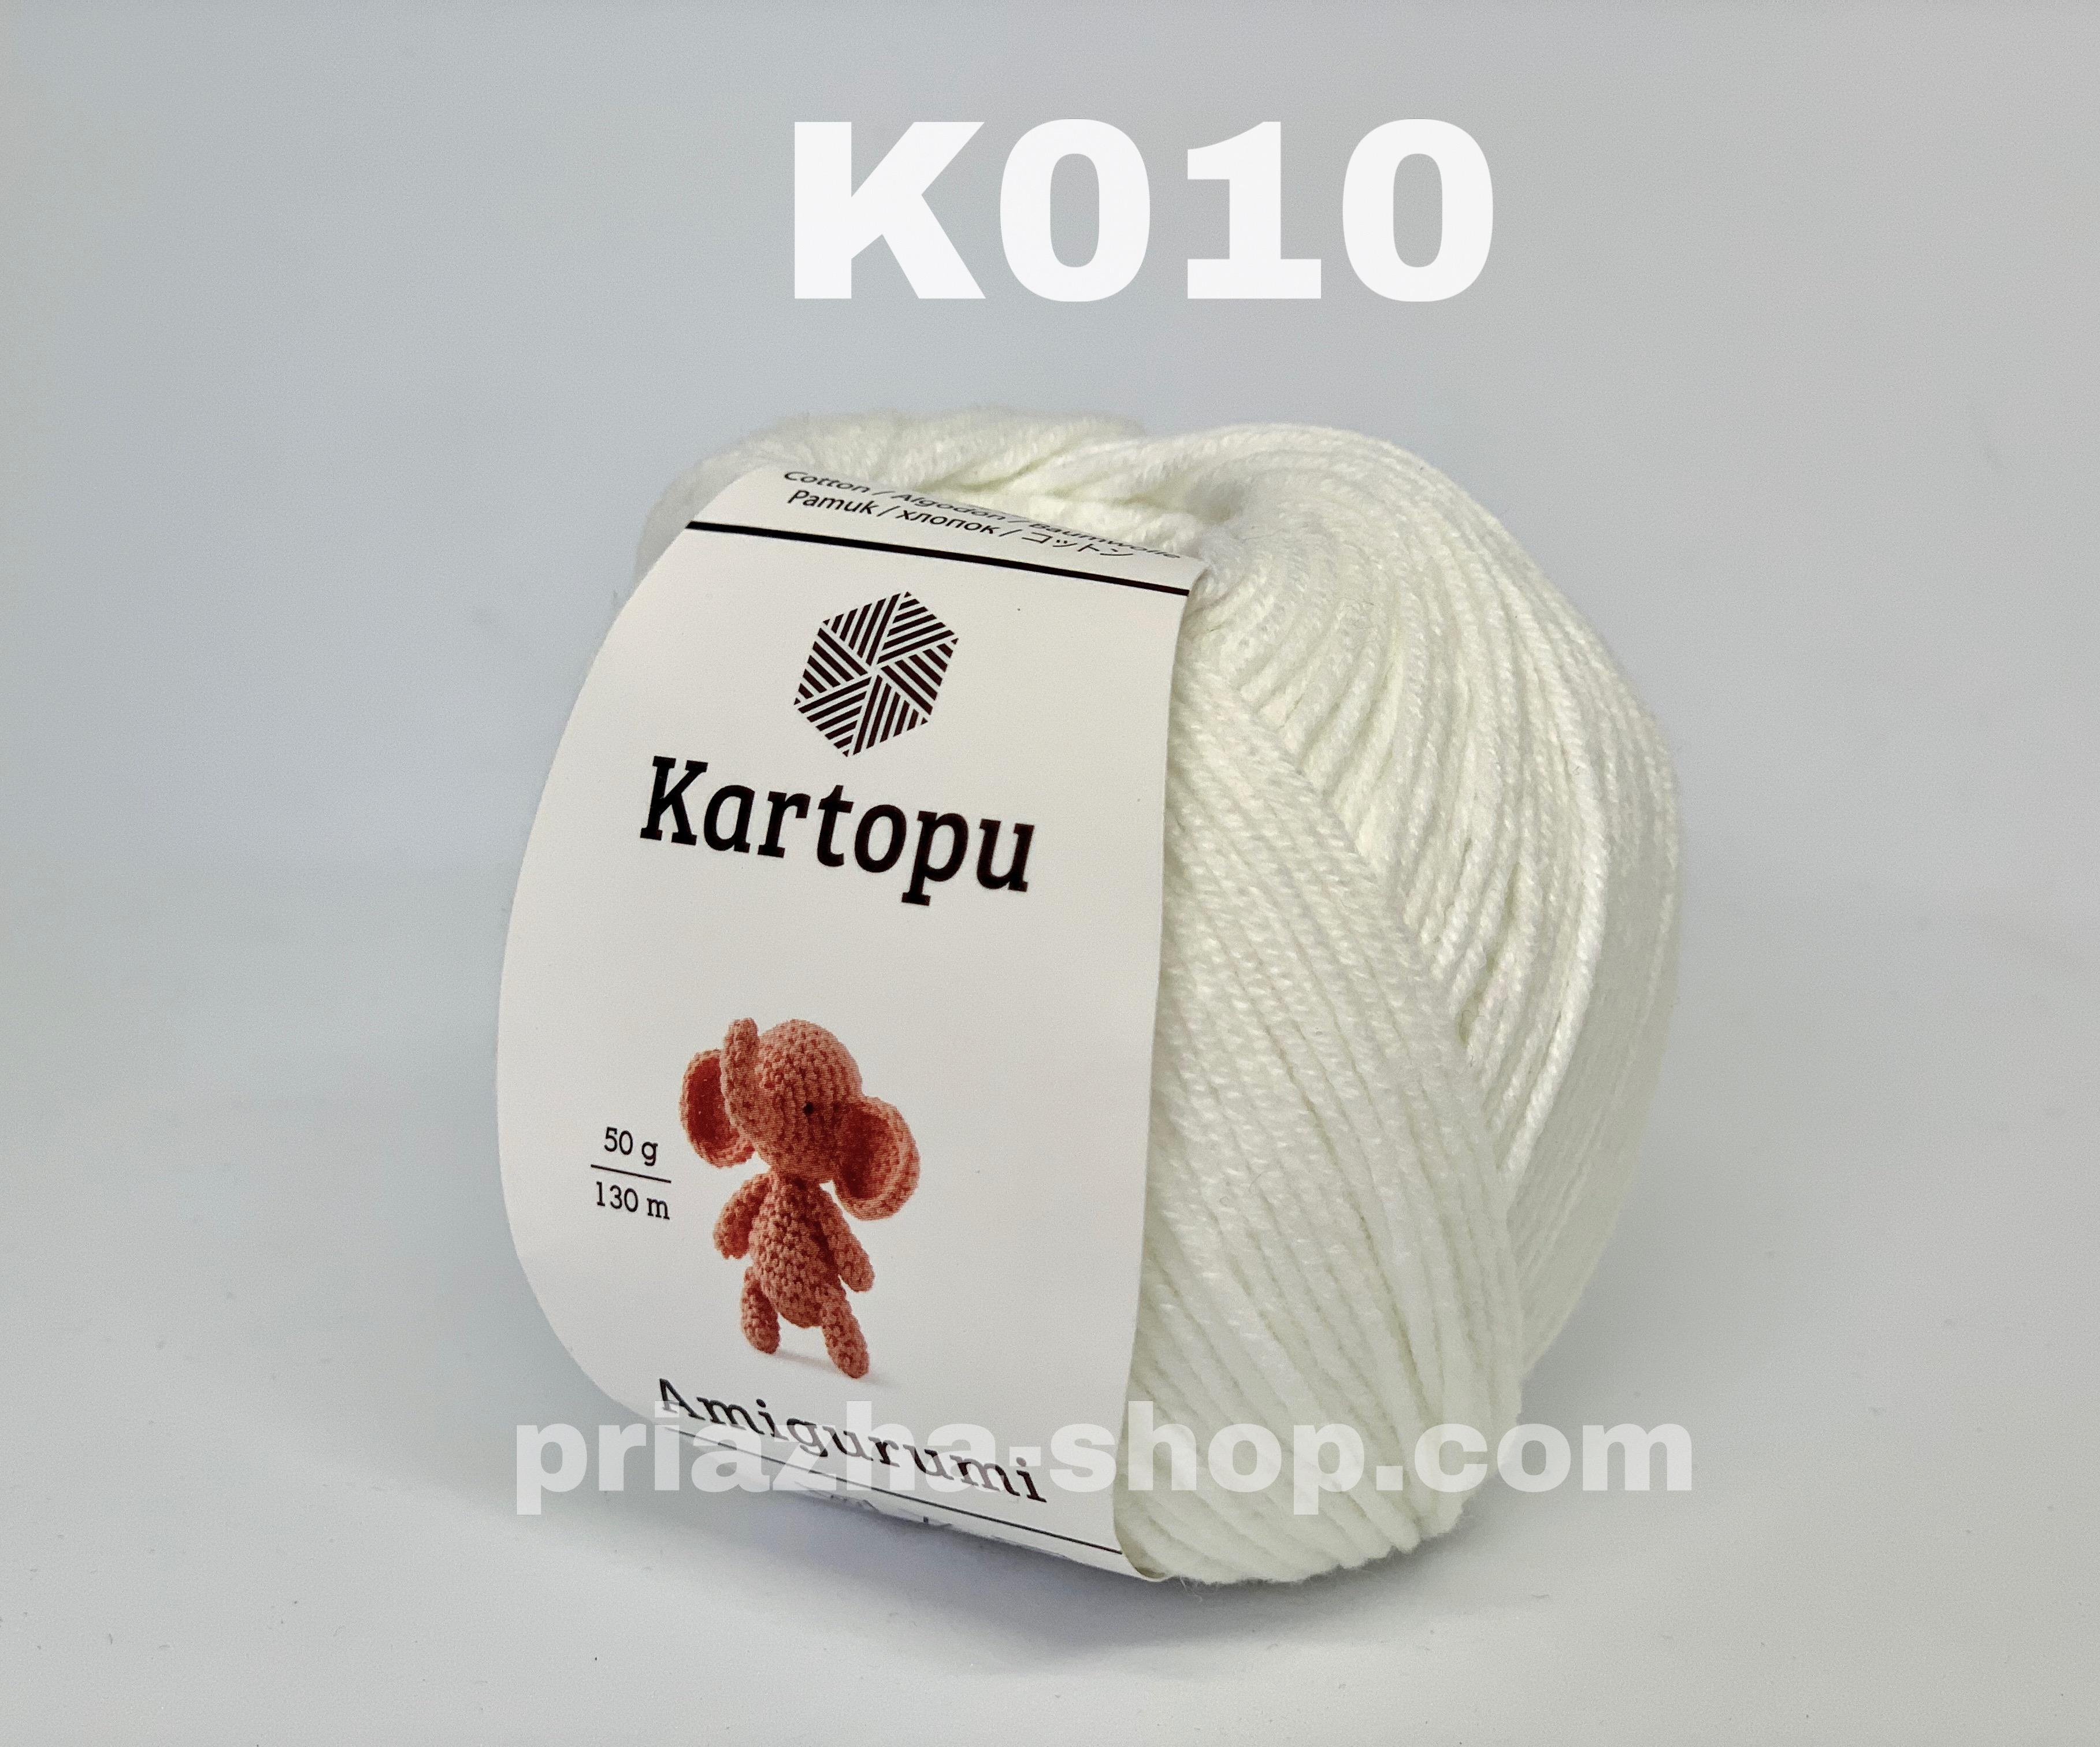 AMIGURUMI KARTOPU (АМИГУРУМИ КАРТОПУ), цена 2.50 руб., купить в ... | 3024x3634